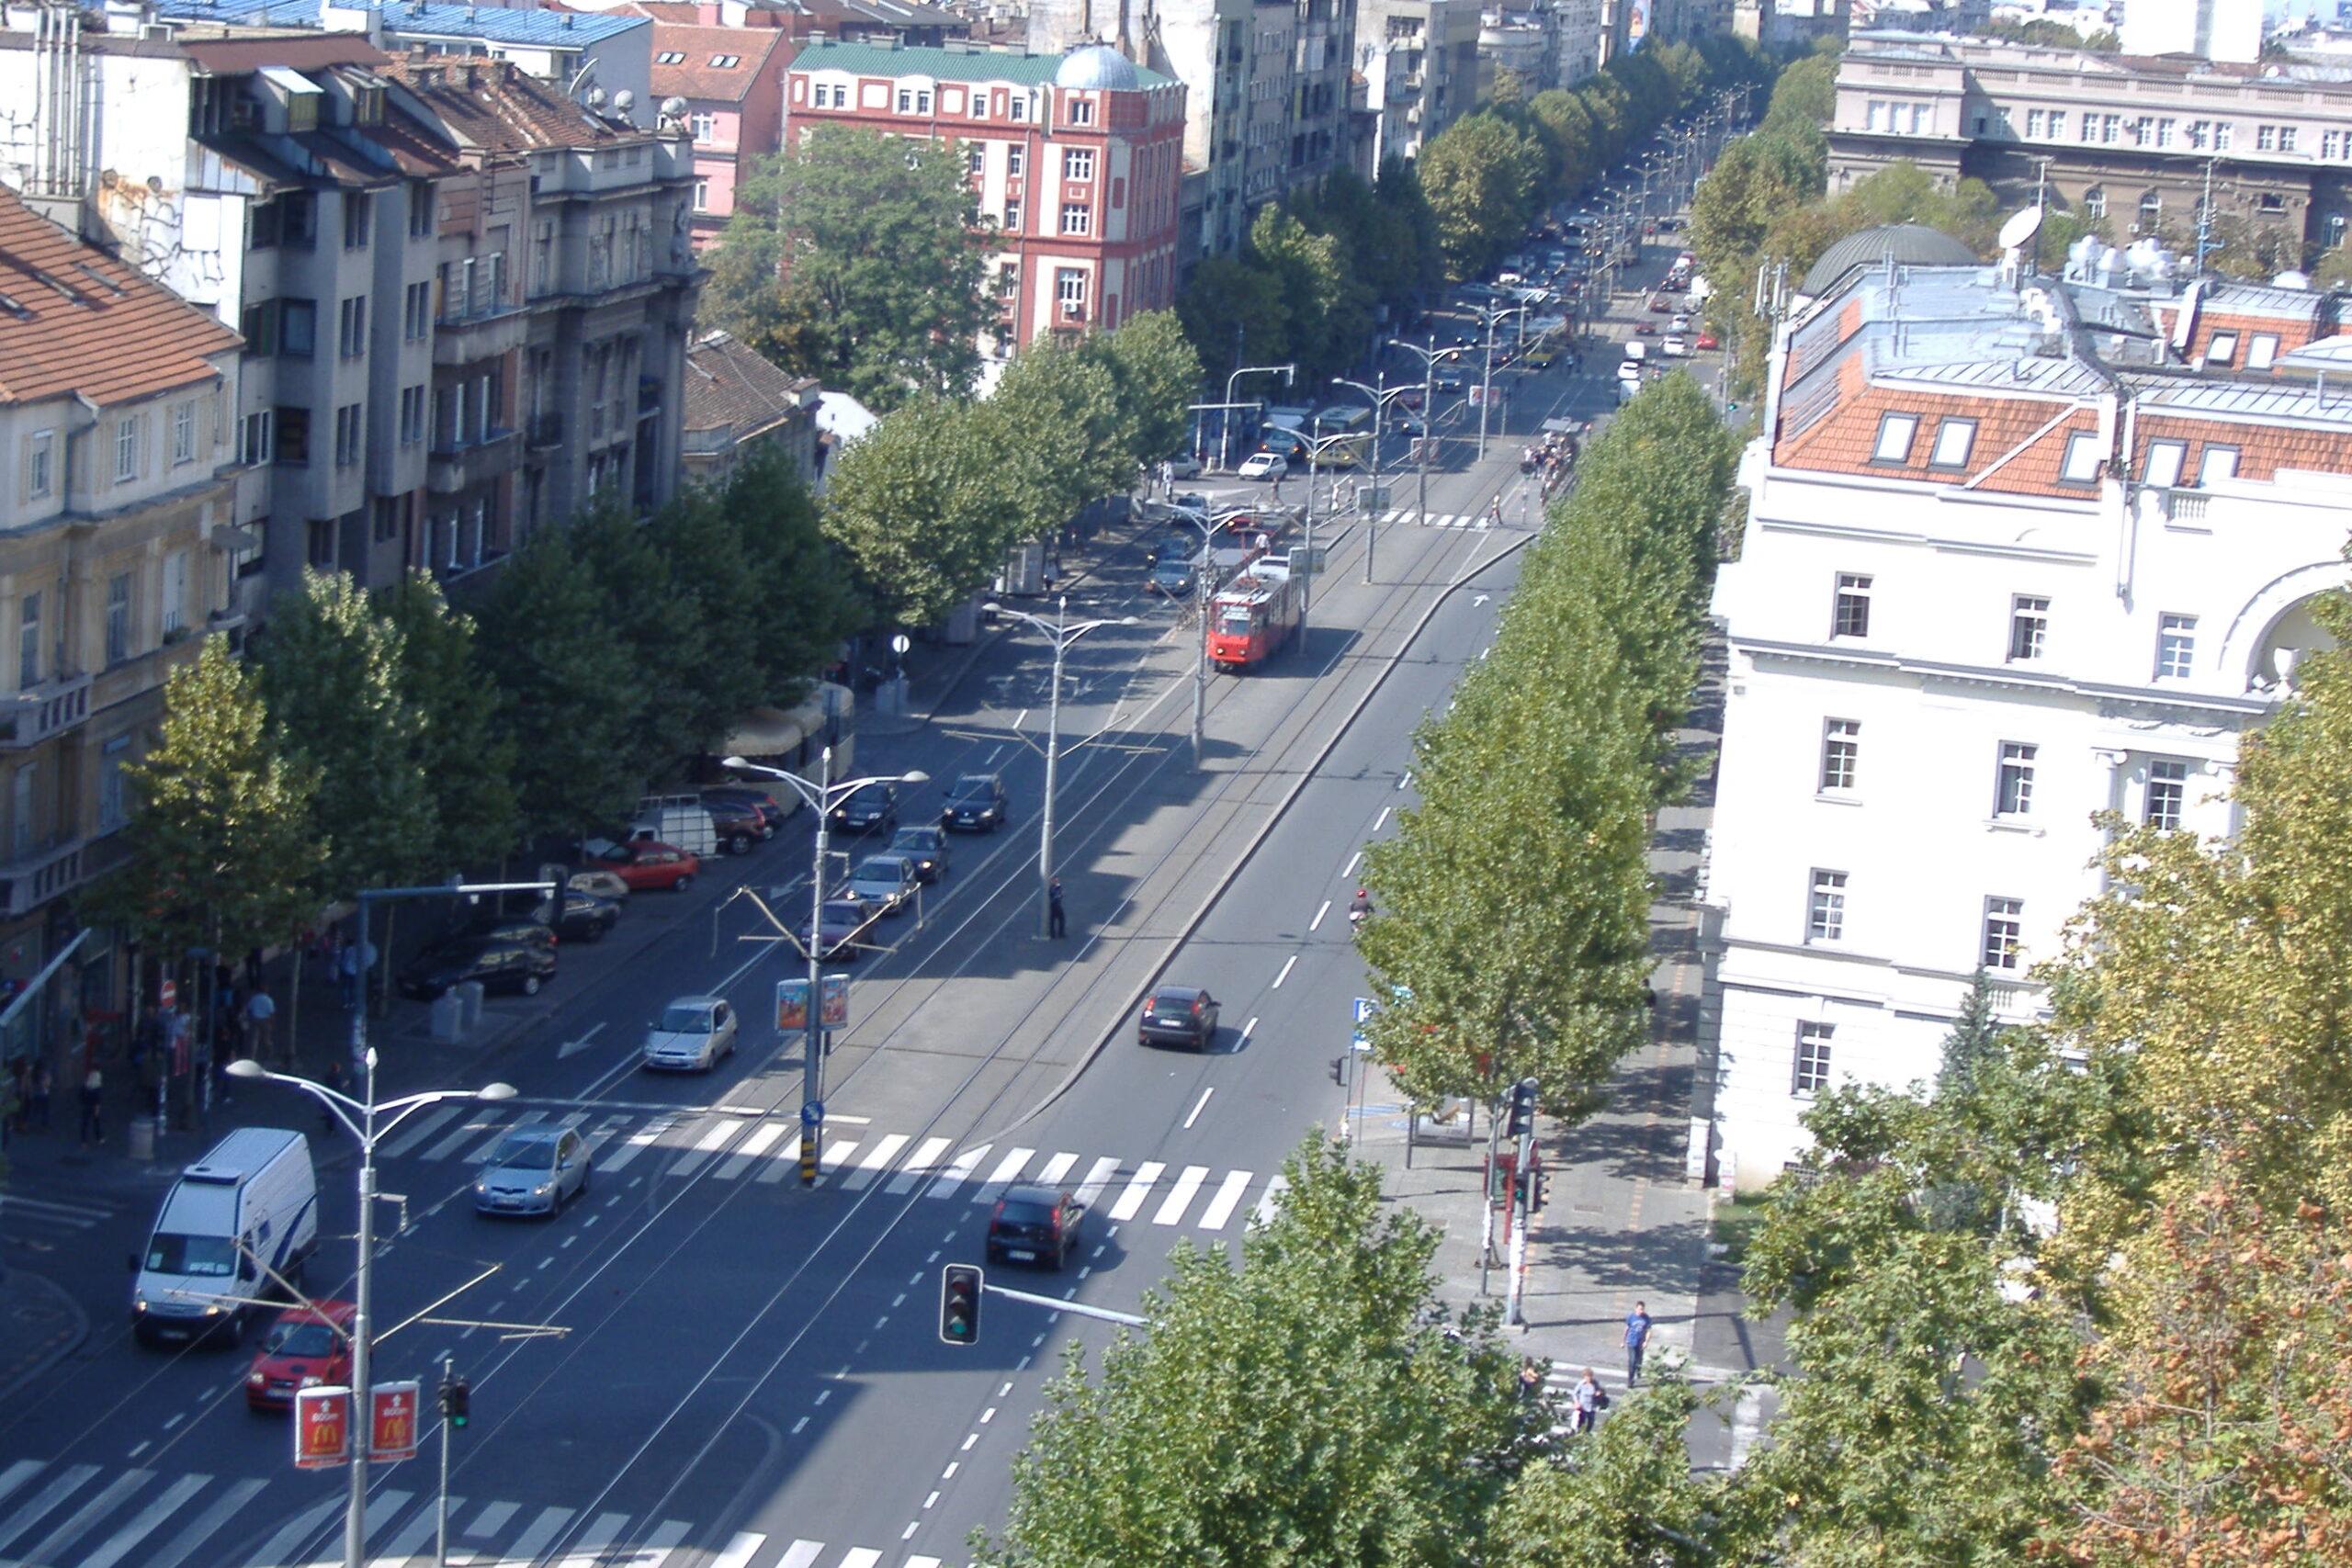 bulevar-kralja-aleksandra-street